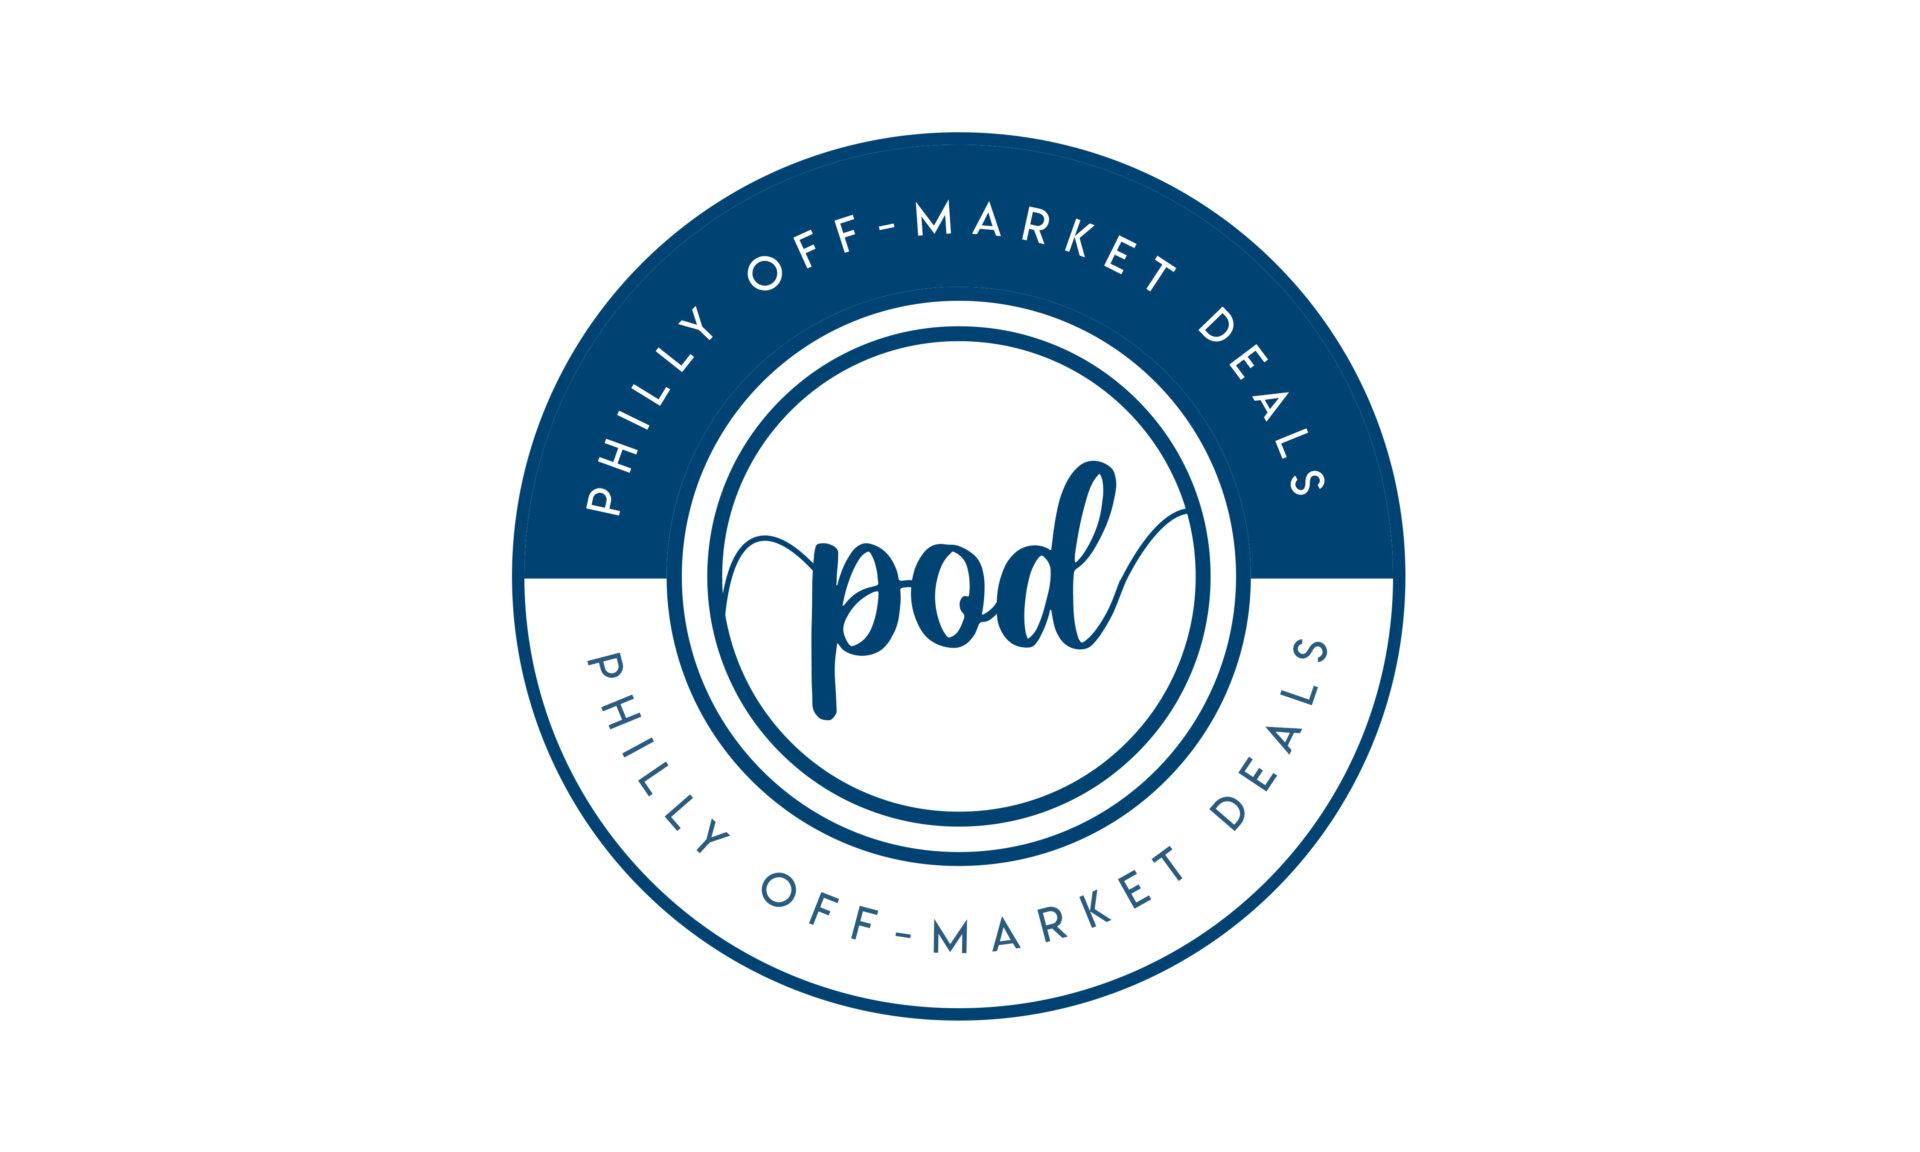 PHILLY OFF-MARKET DEALS logo